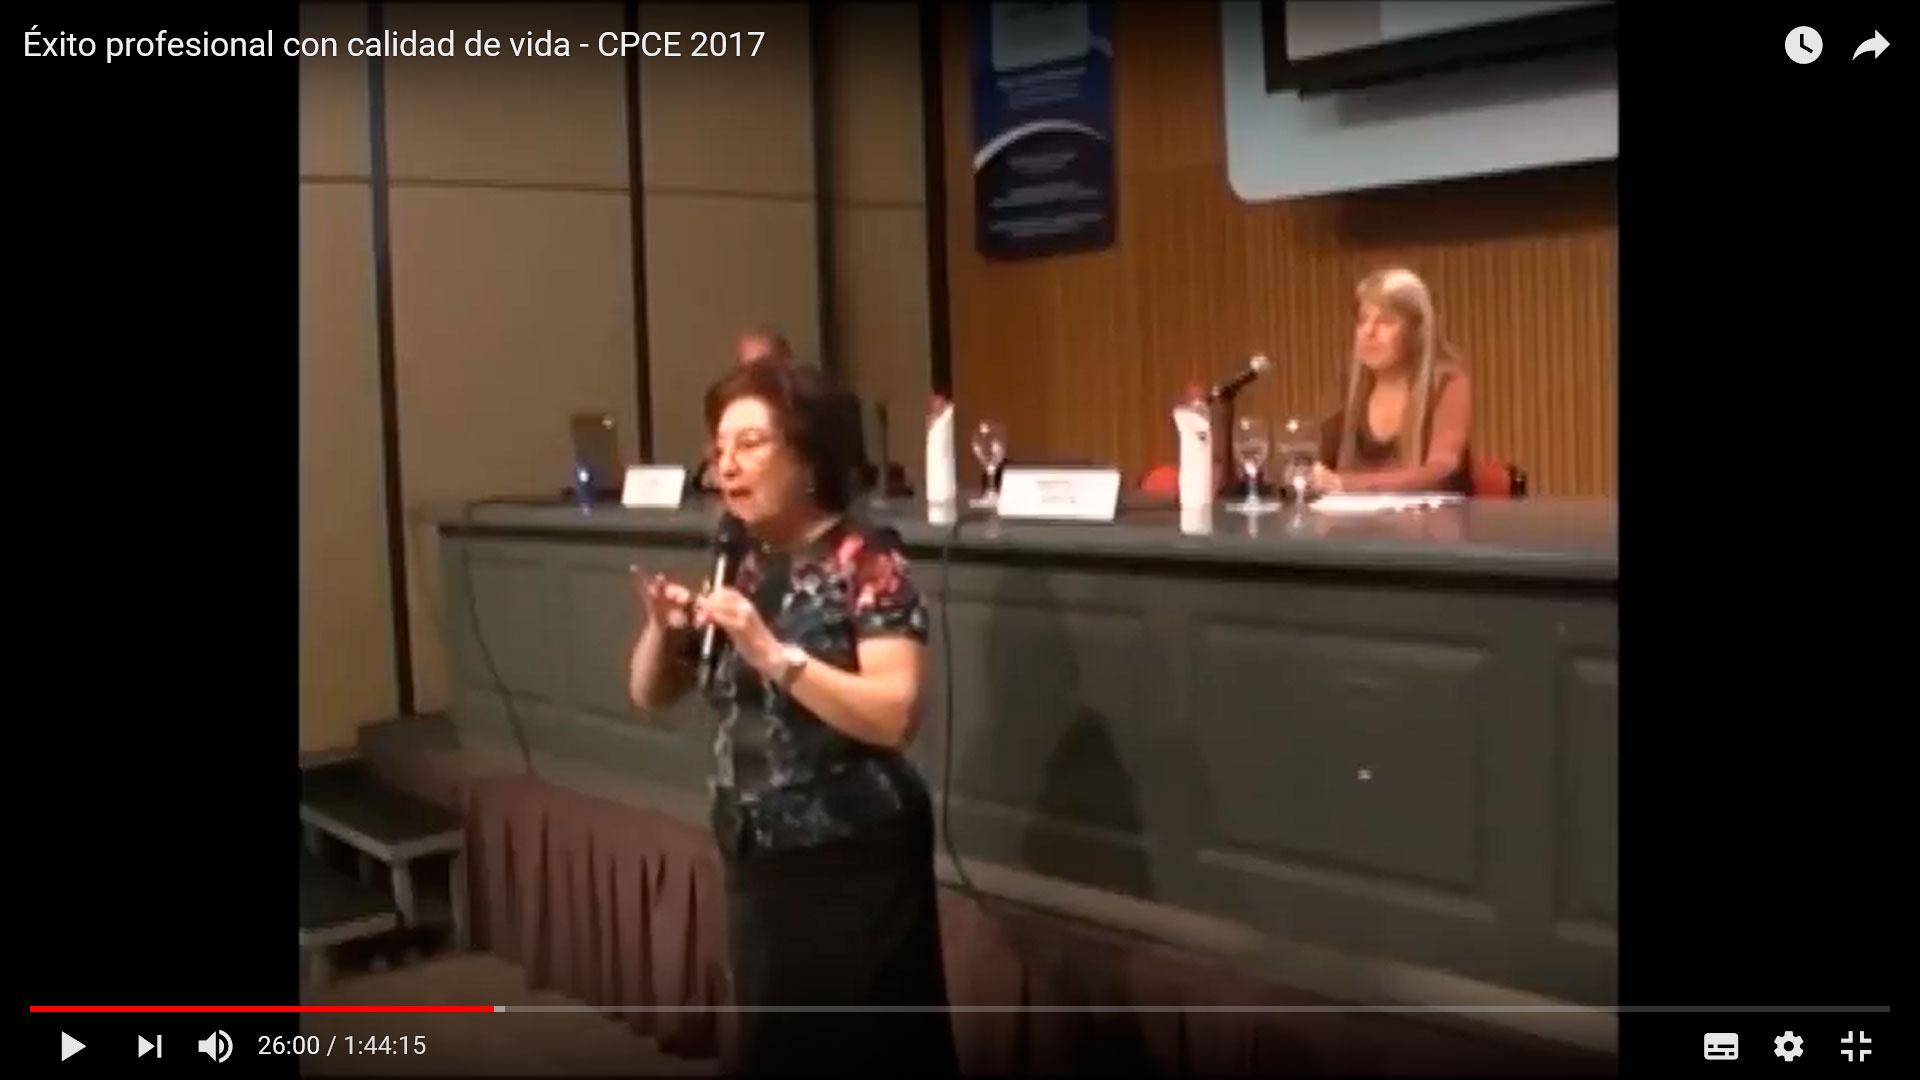 Éxito profesional con calidad de vida - CPCE 2017